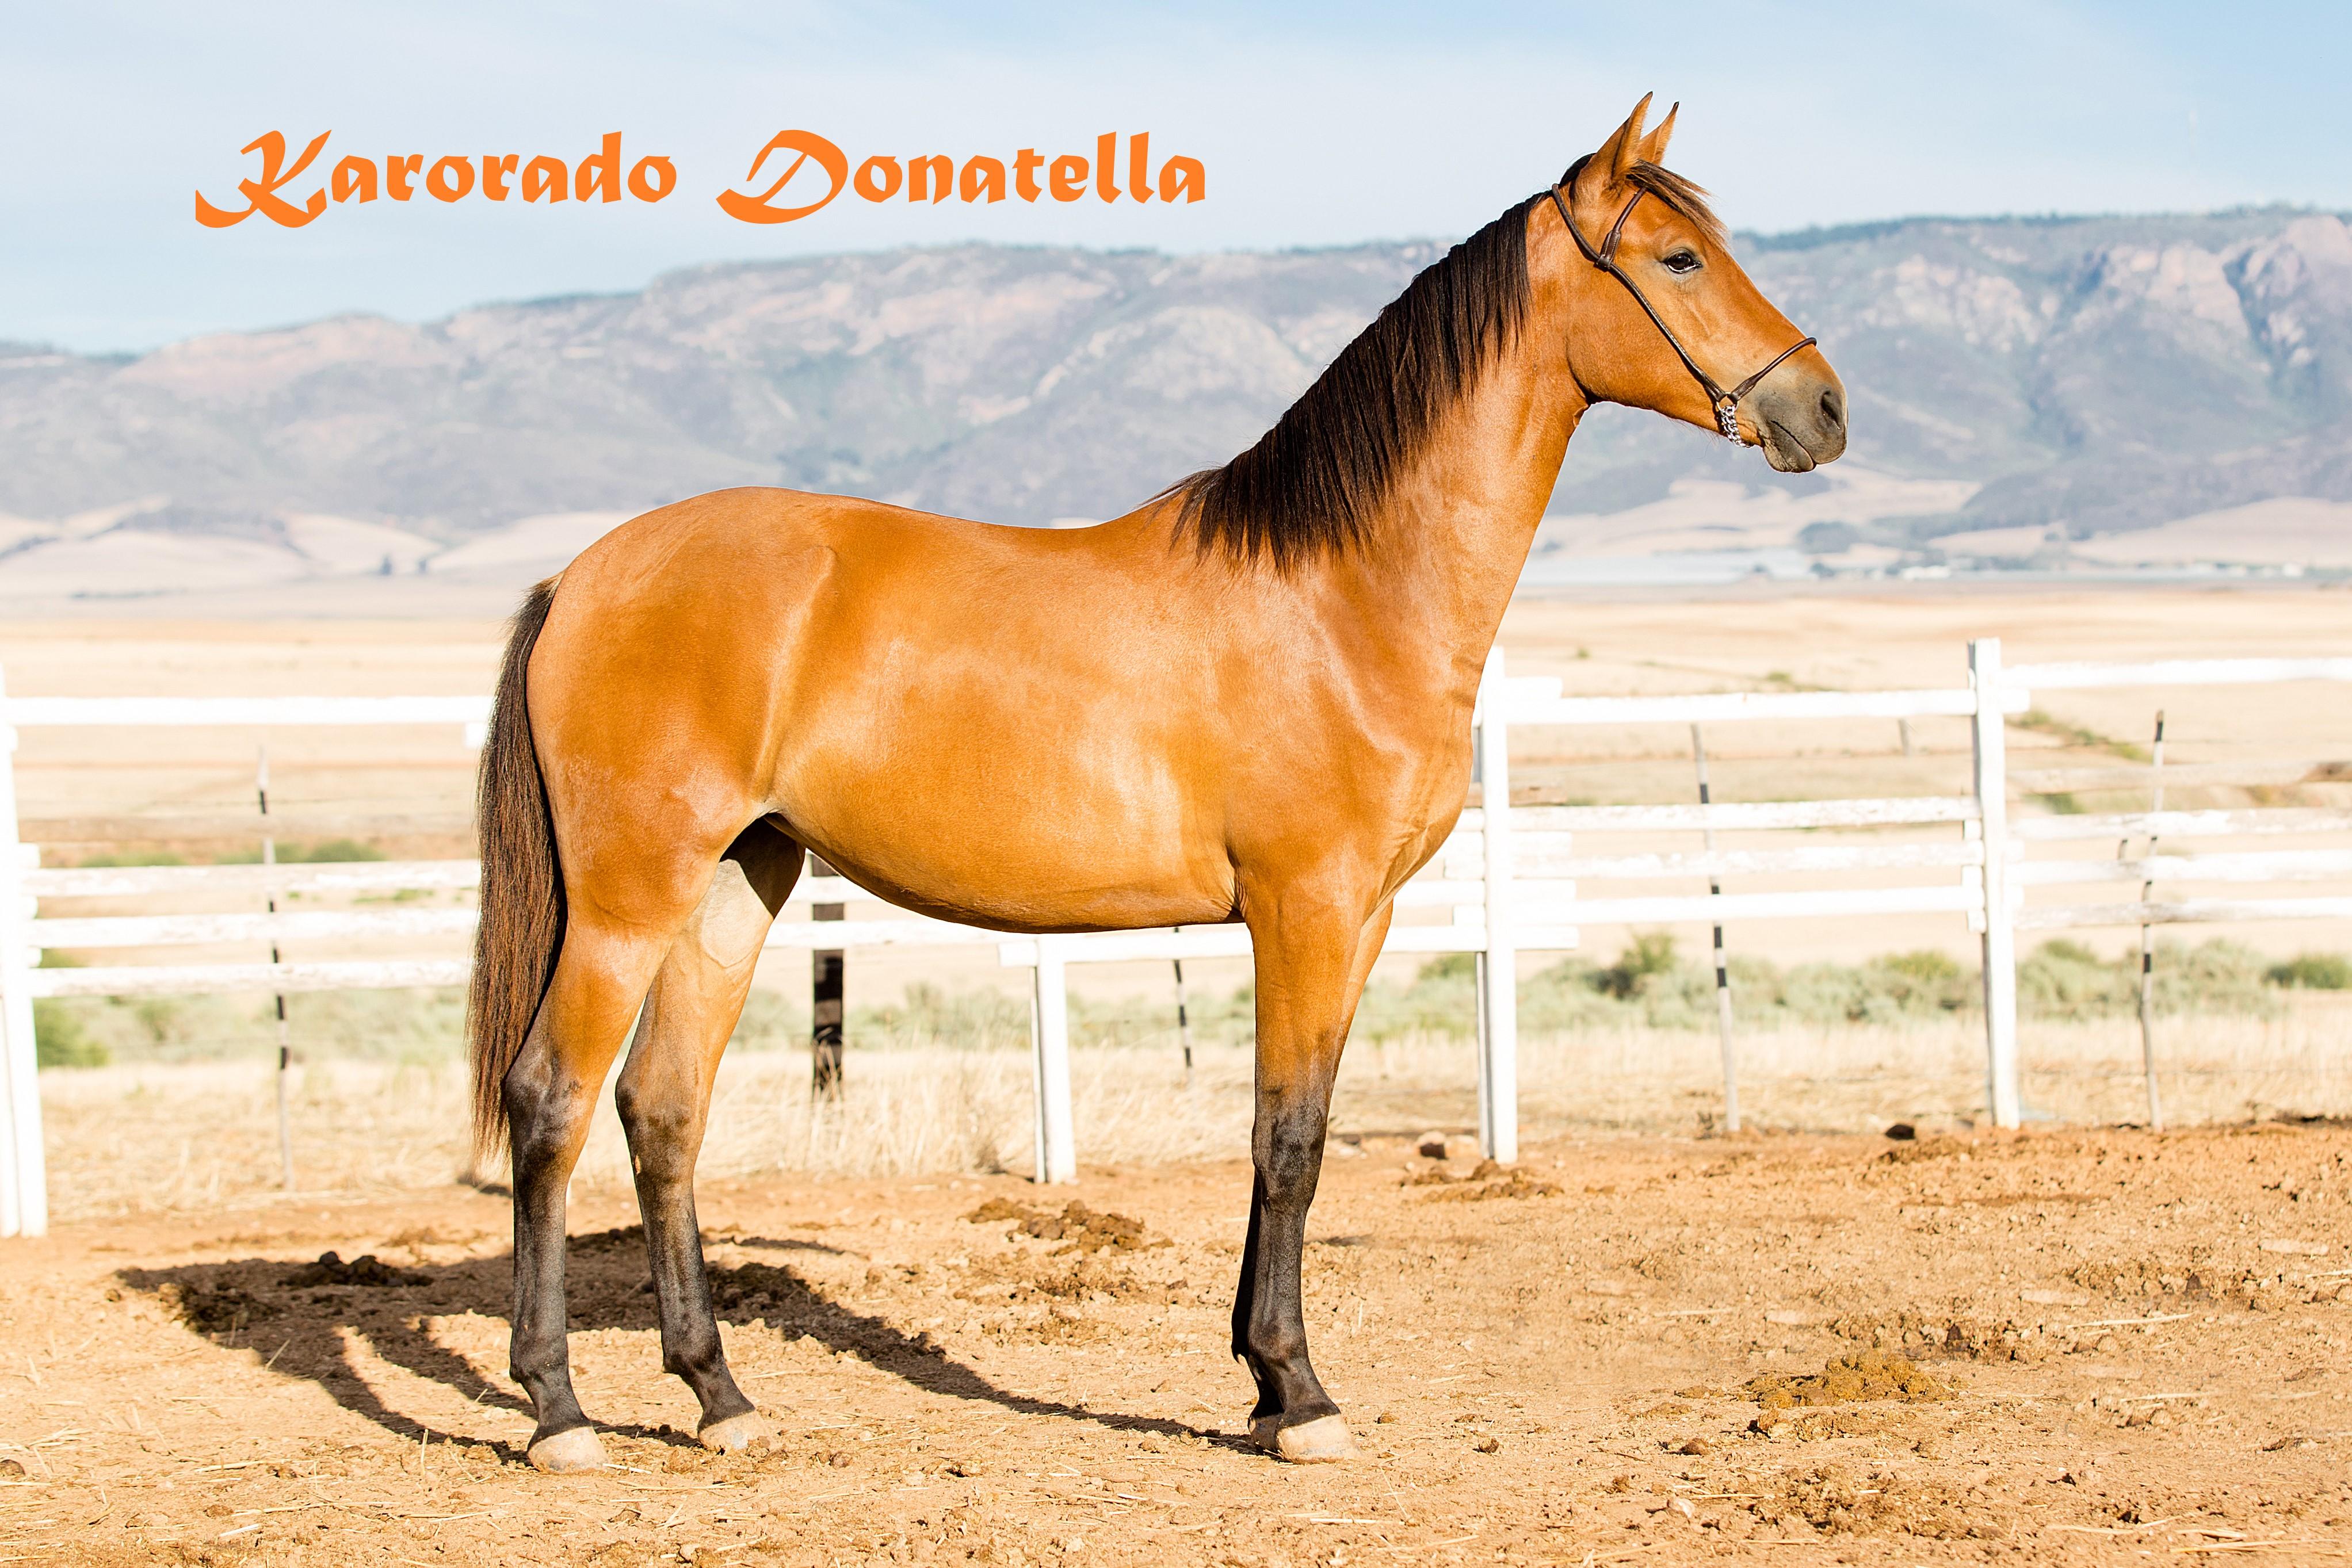 Donatella1